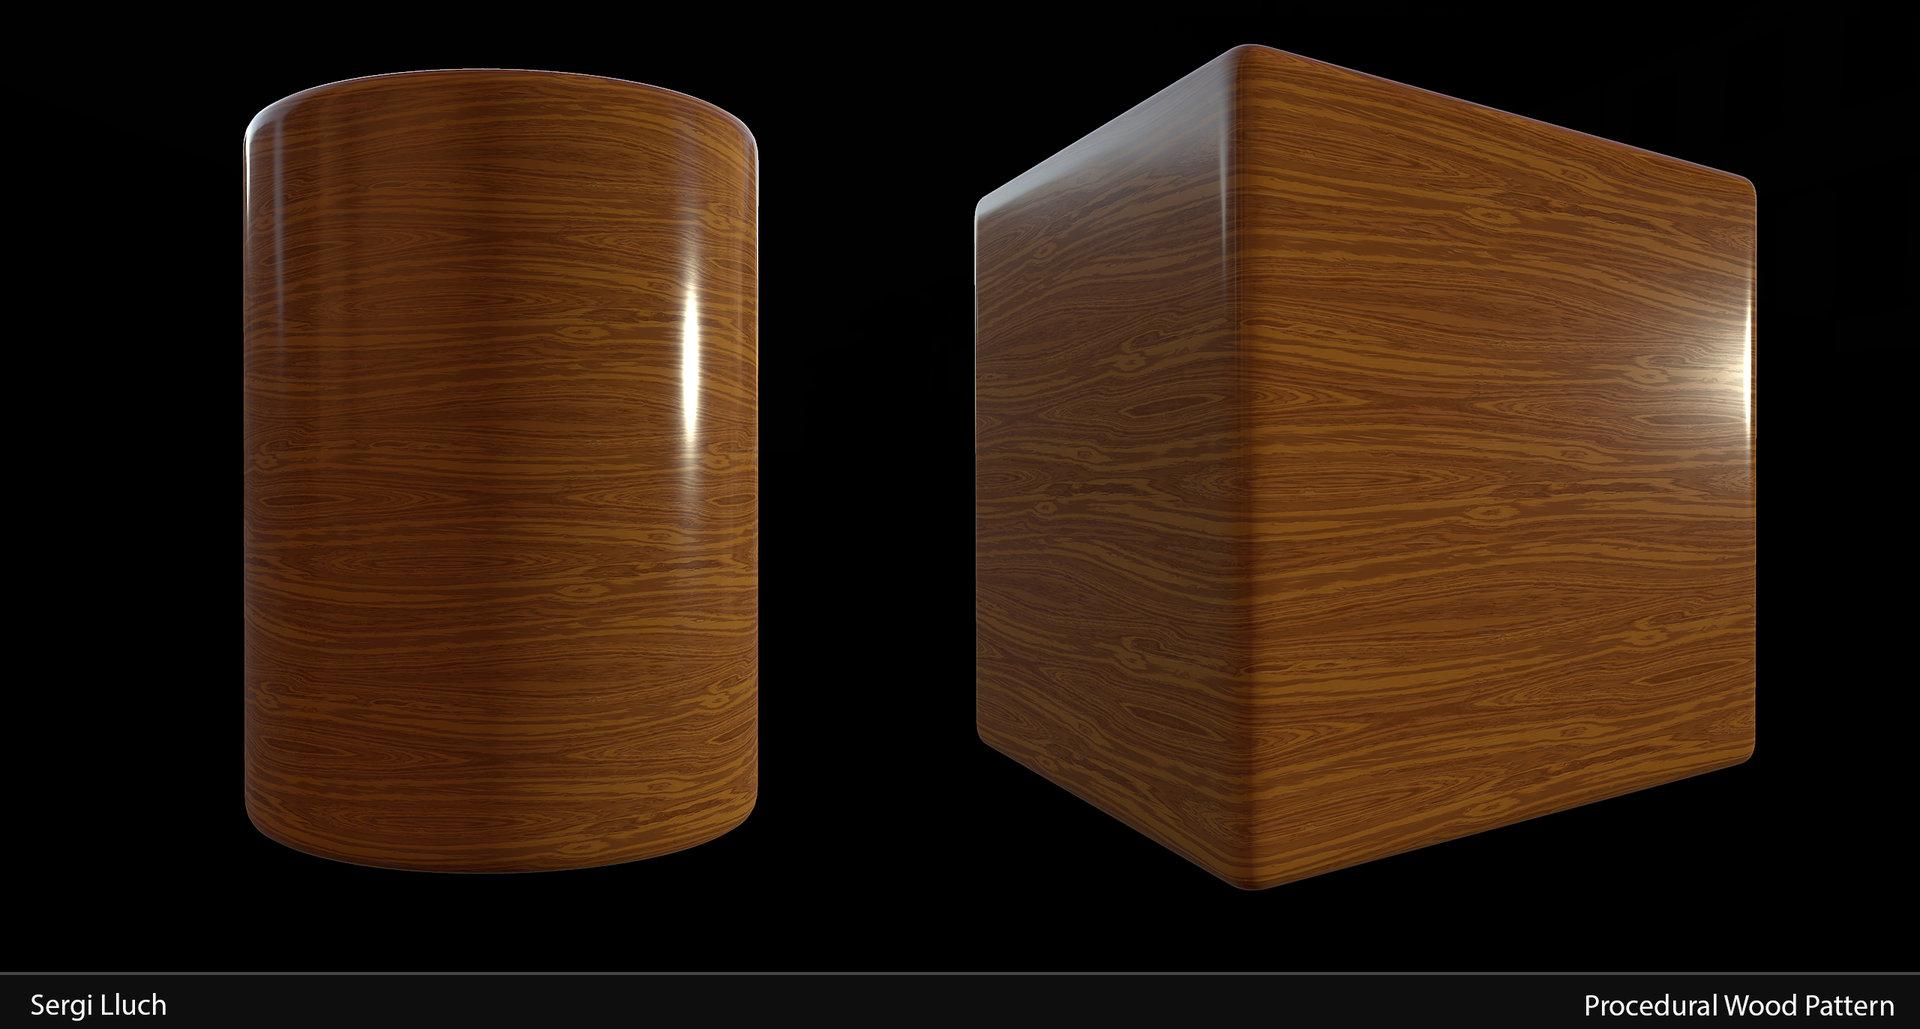 Sergi lluch wood proc material